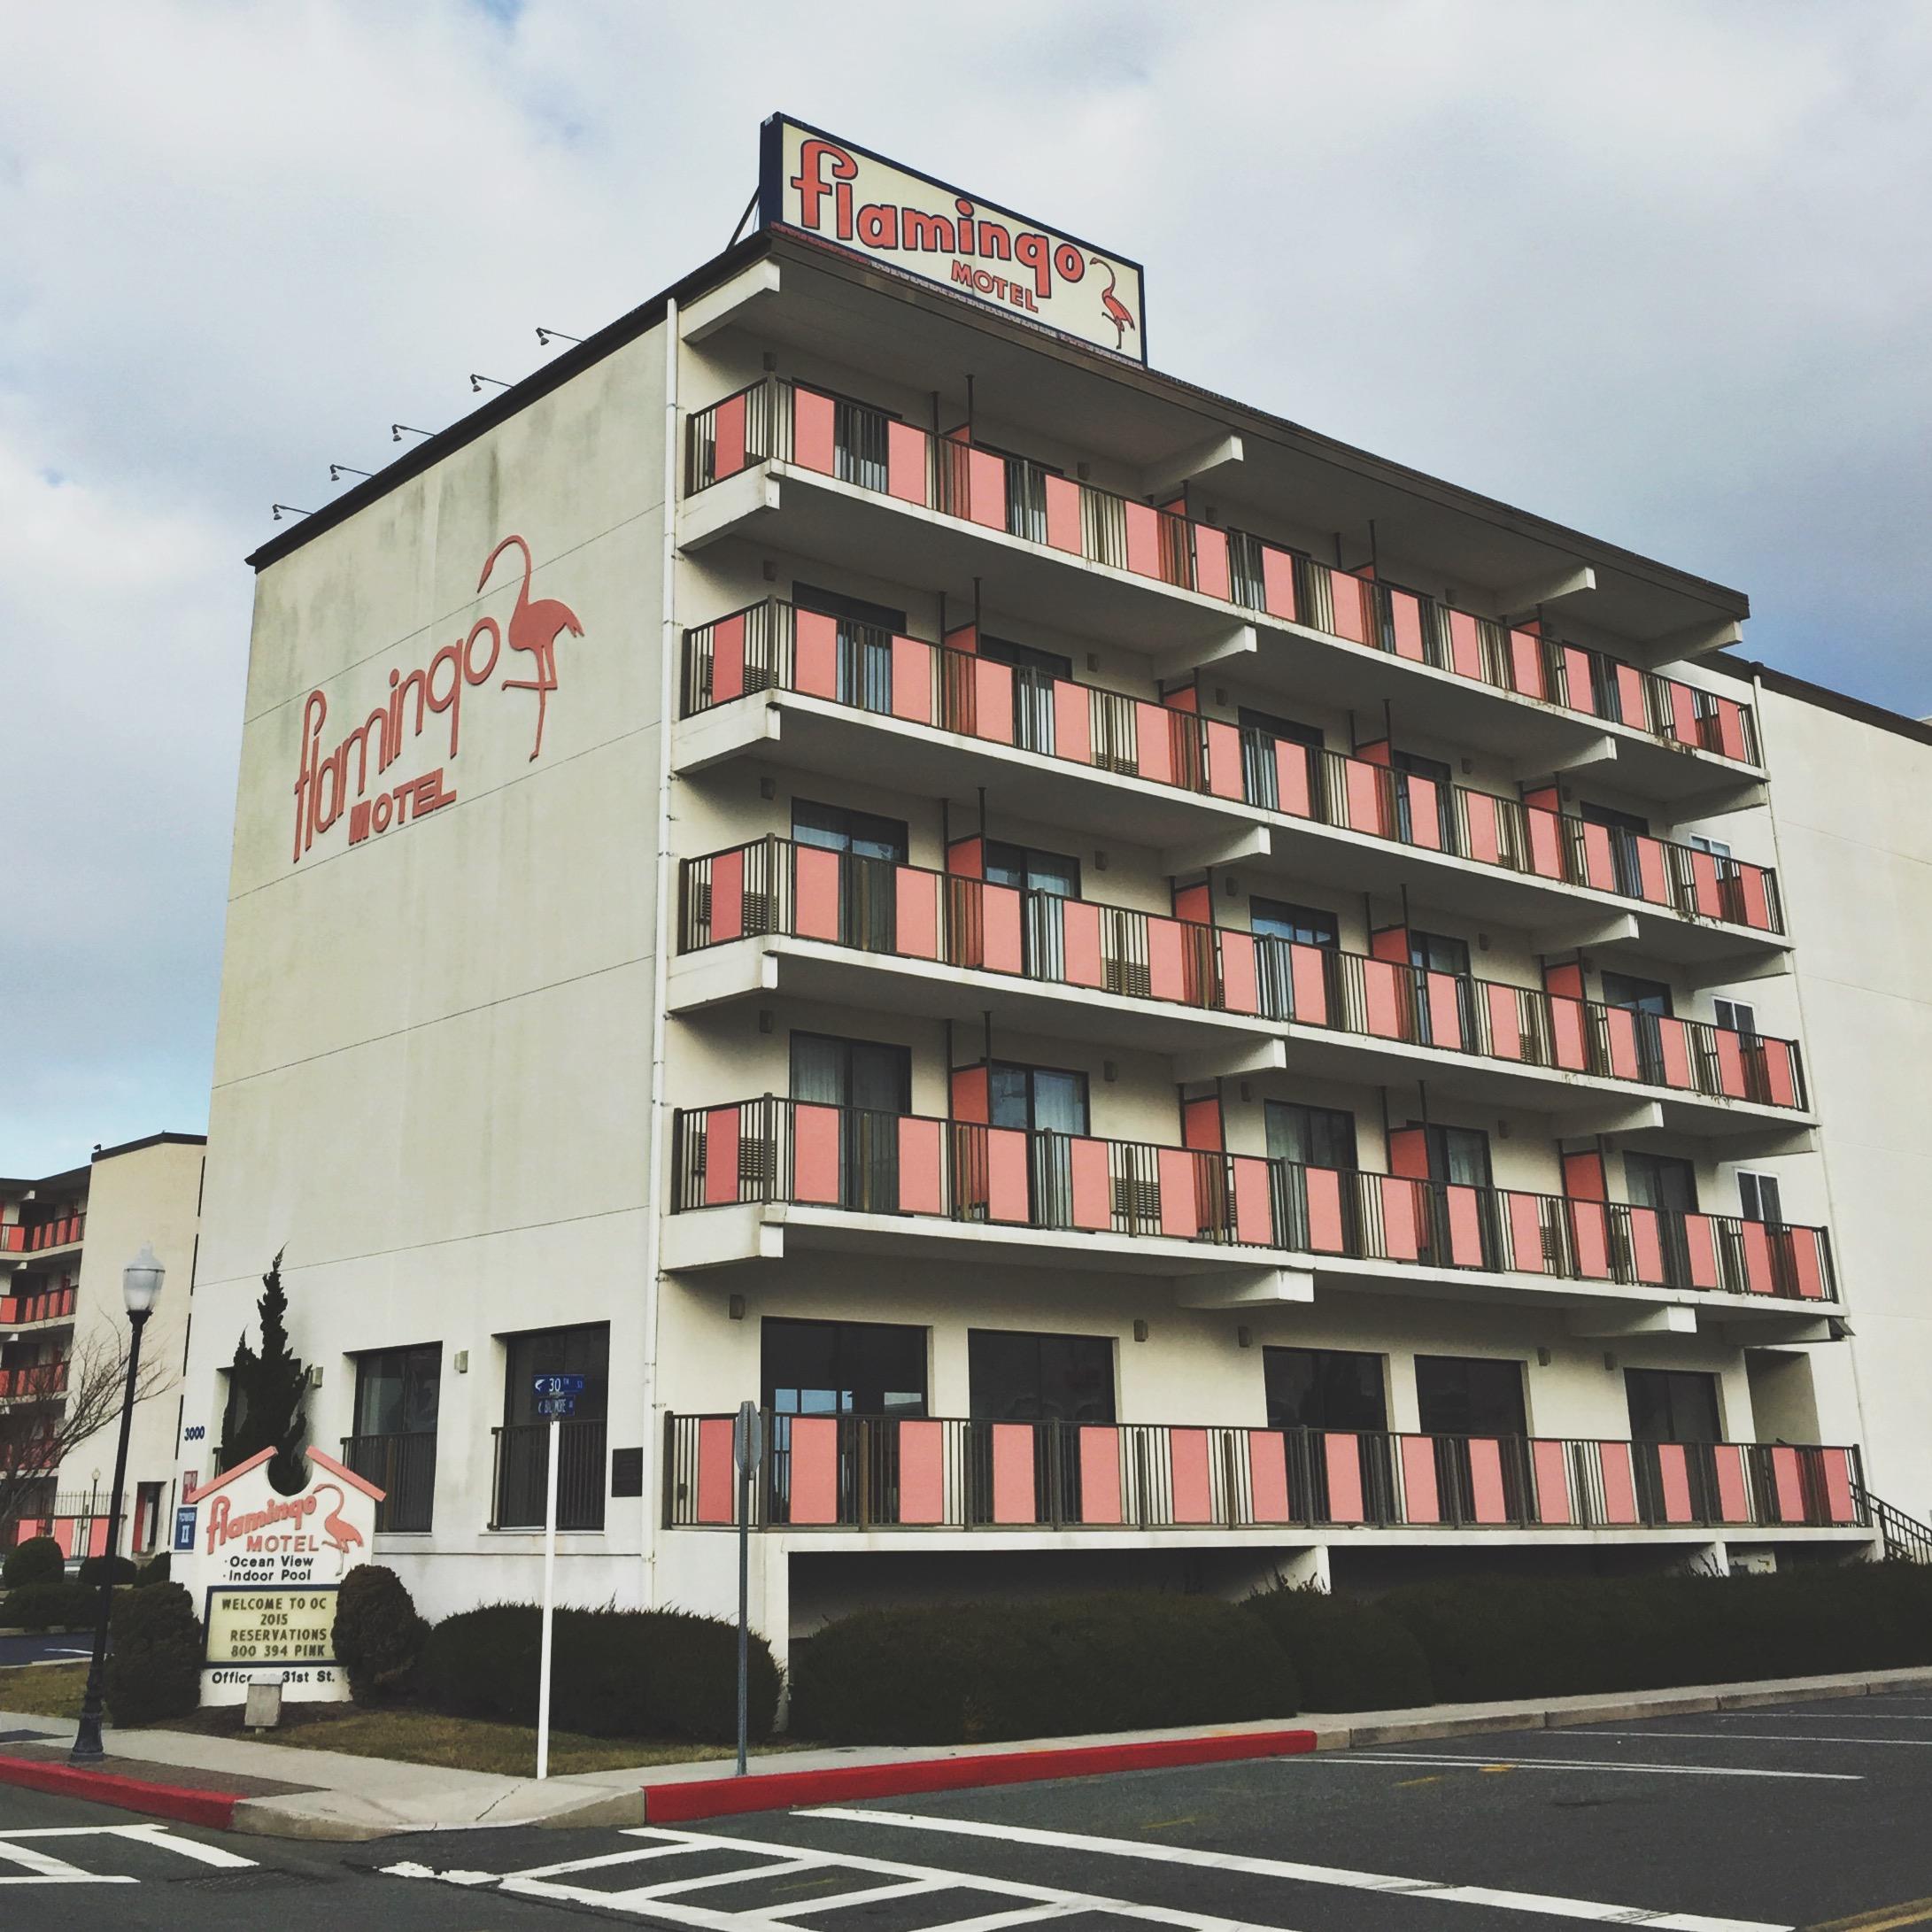 Flamingo Motel - 31st Street Ocean City, Maryland 2015